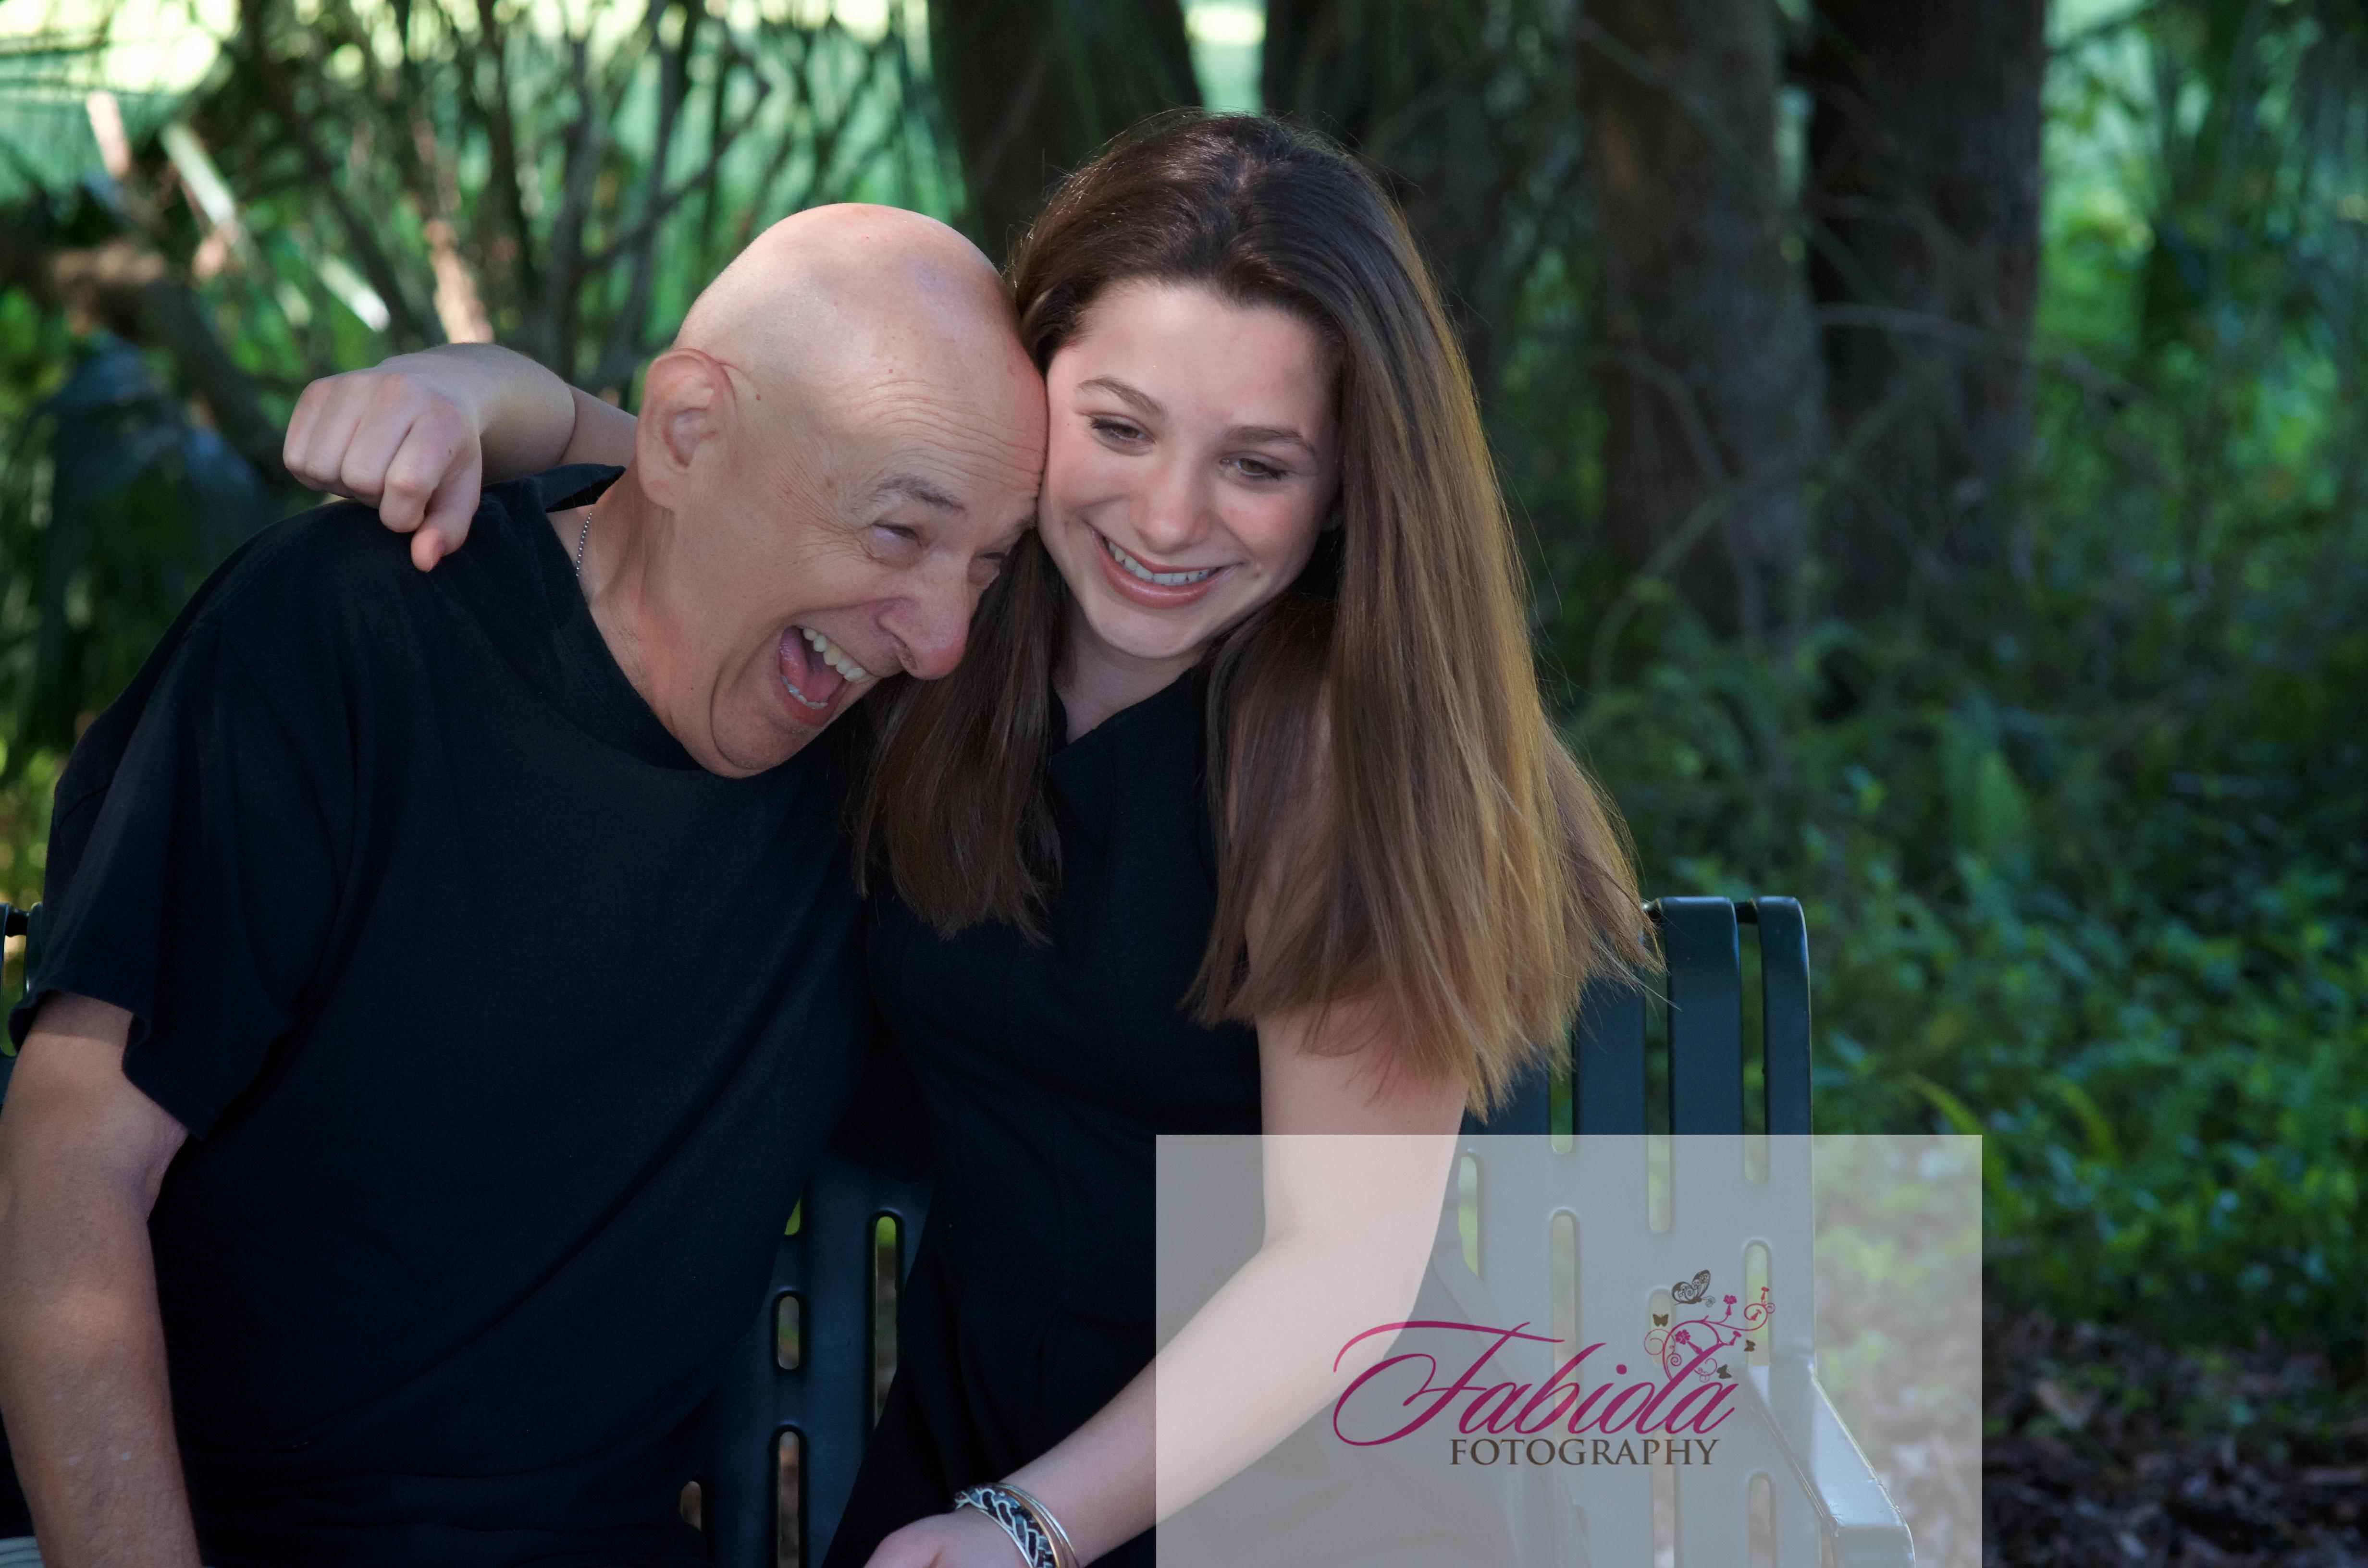 Fabiola Fotography image 14